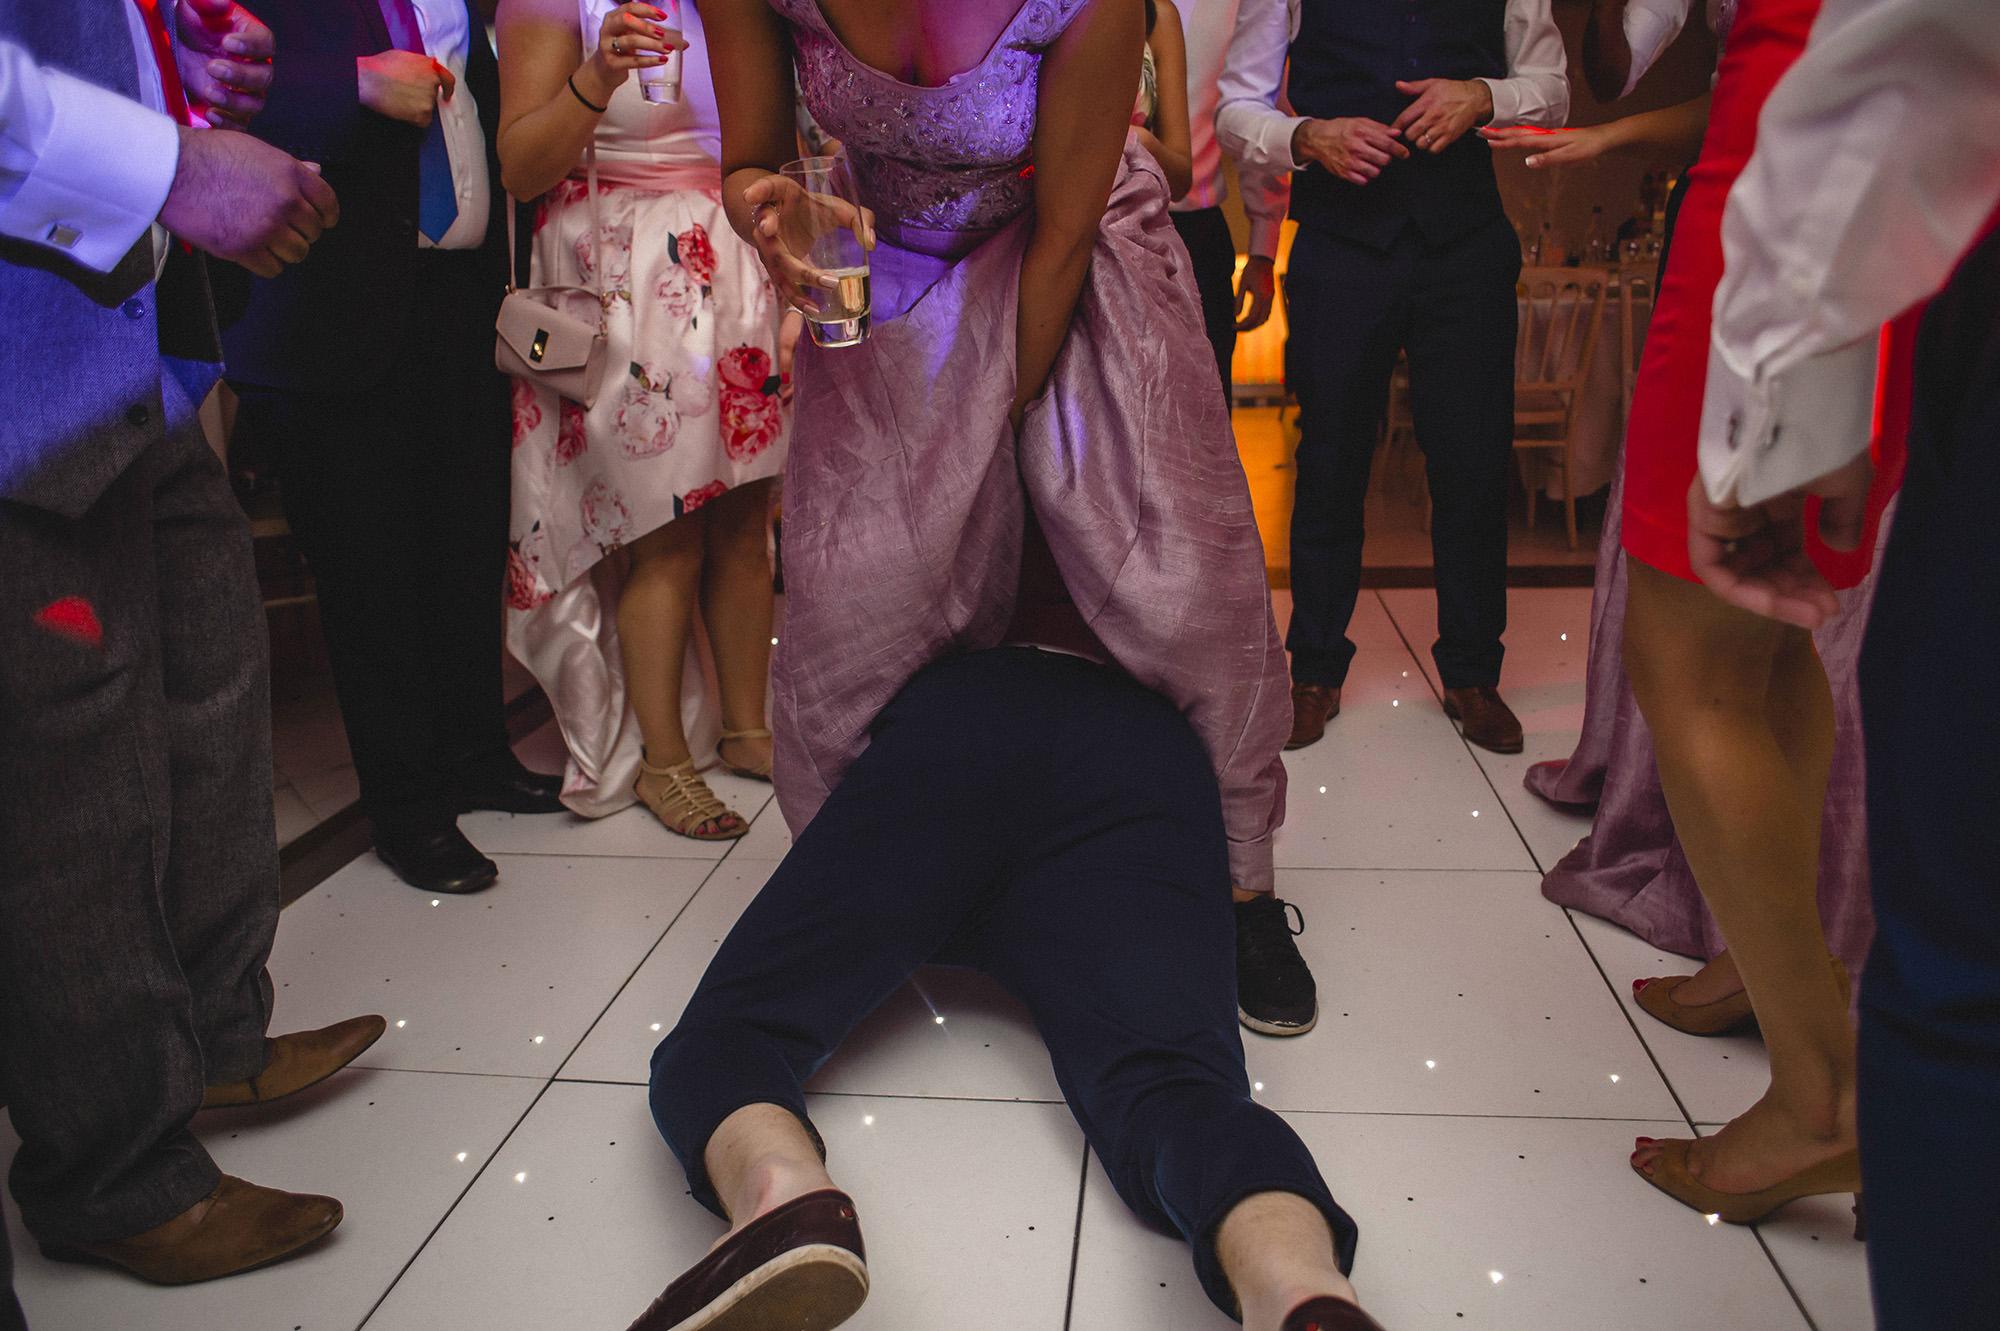 party antics at the wedding reception